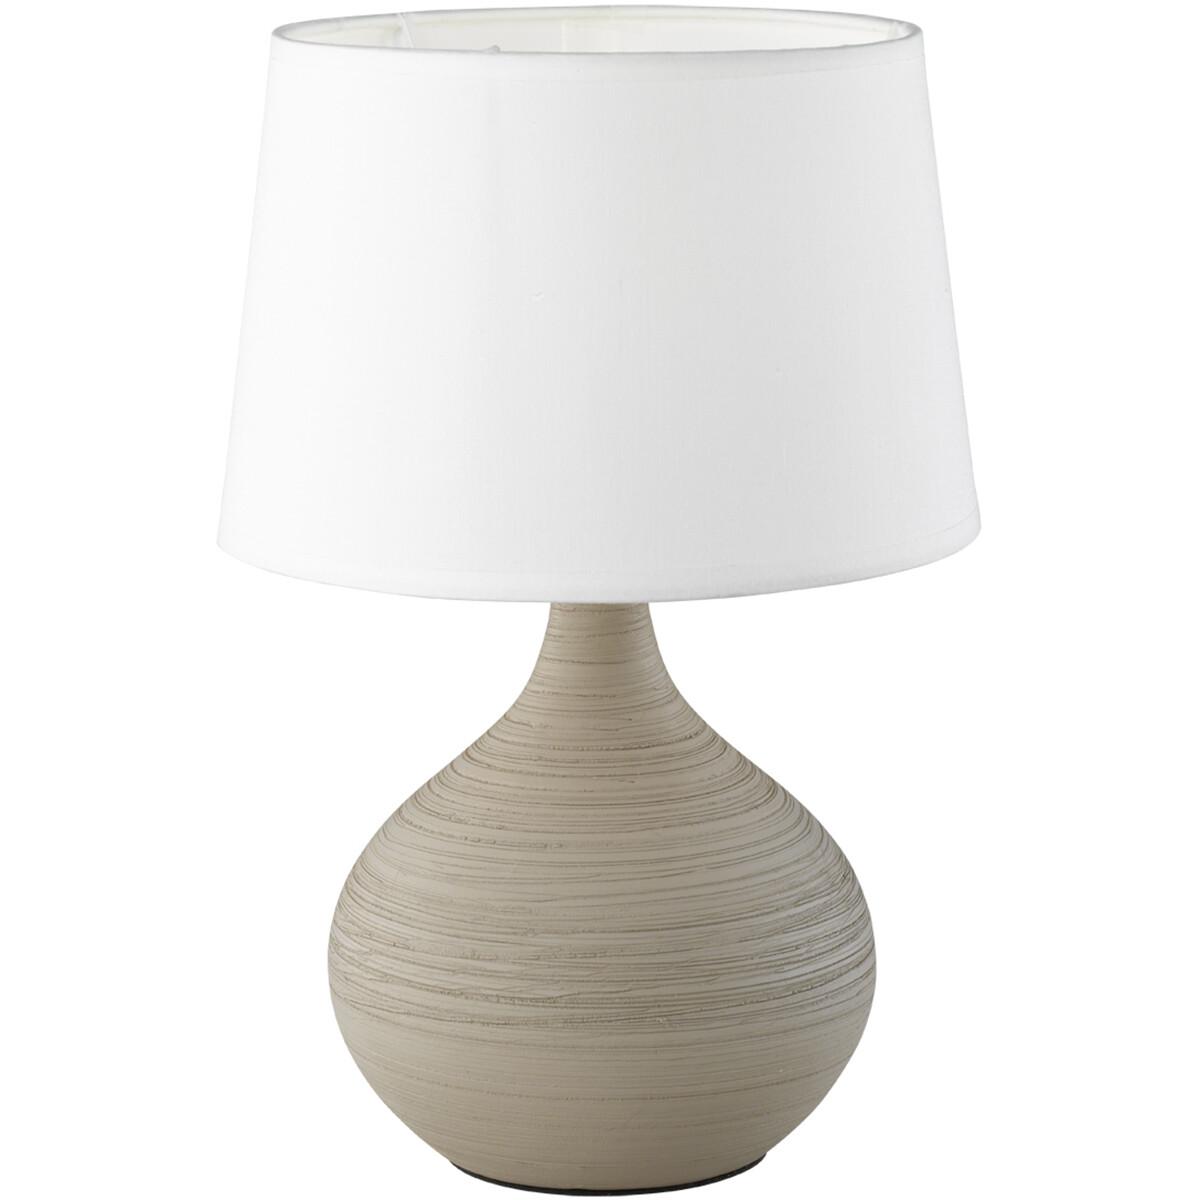 LED Tafellamp - Tafelverlichting - Trion Martan - E14 Fitting - Rond - Mat Grijs - Keramiek